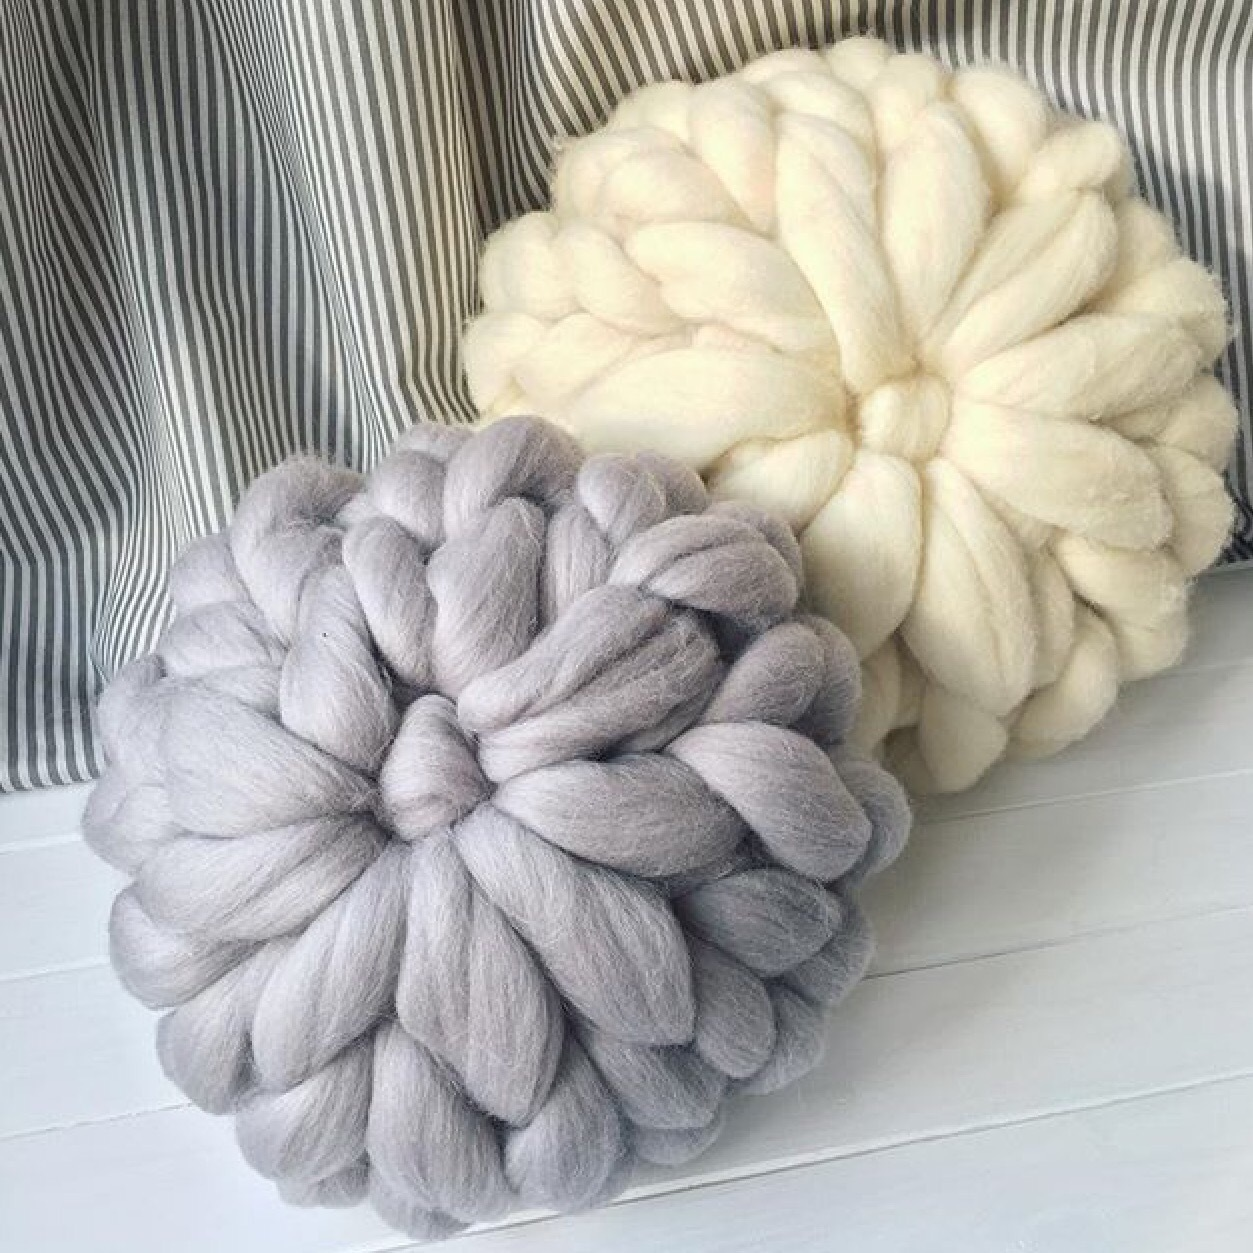 Crochet Chunky Wool Pillow Baby Room Decorative Pillows Cute Kids Car Pillow Cushion Knitting Pillow Birthday Christmas Gift